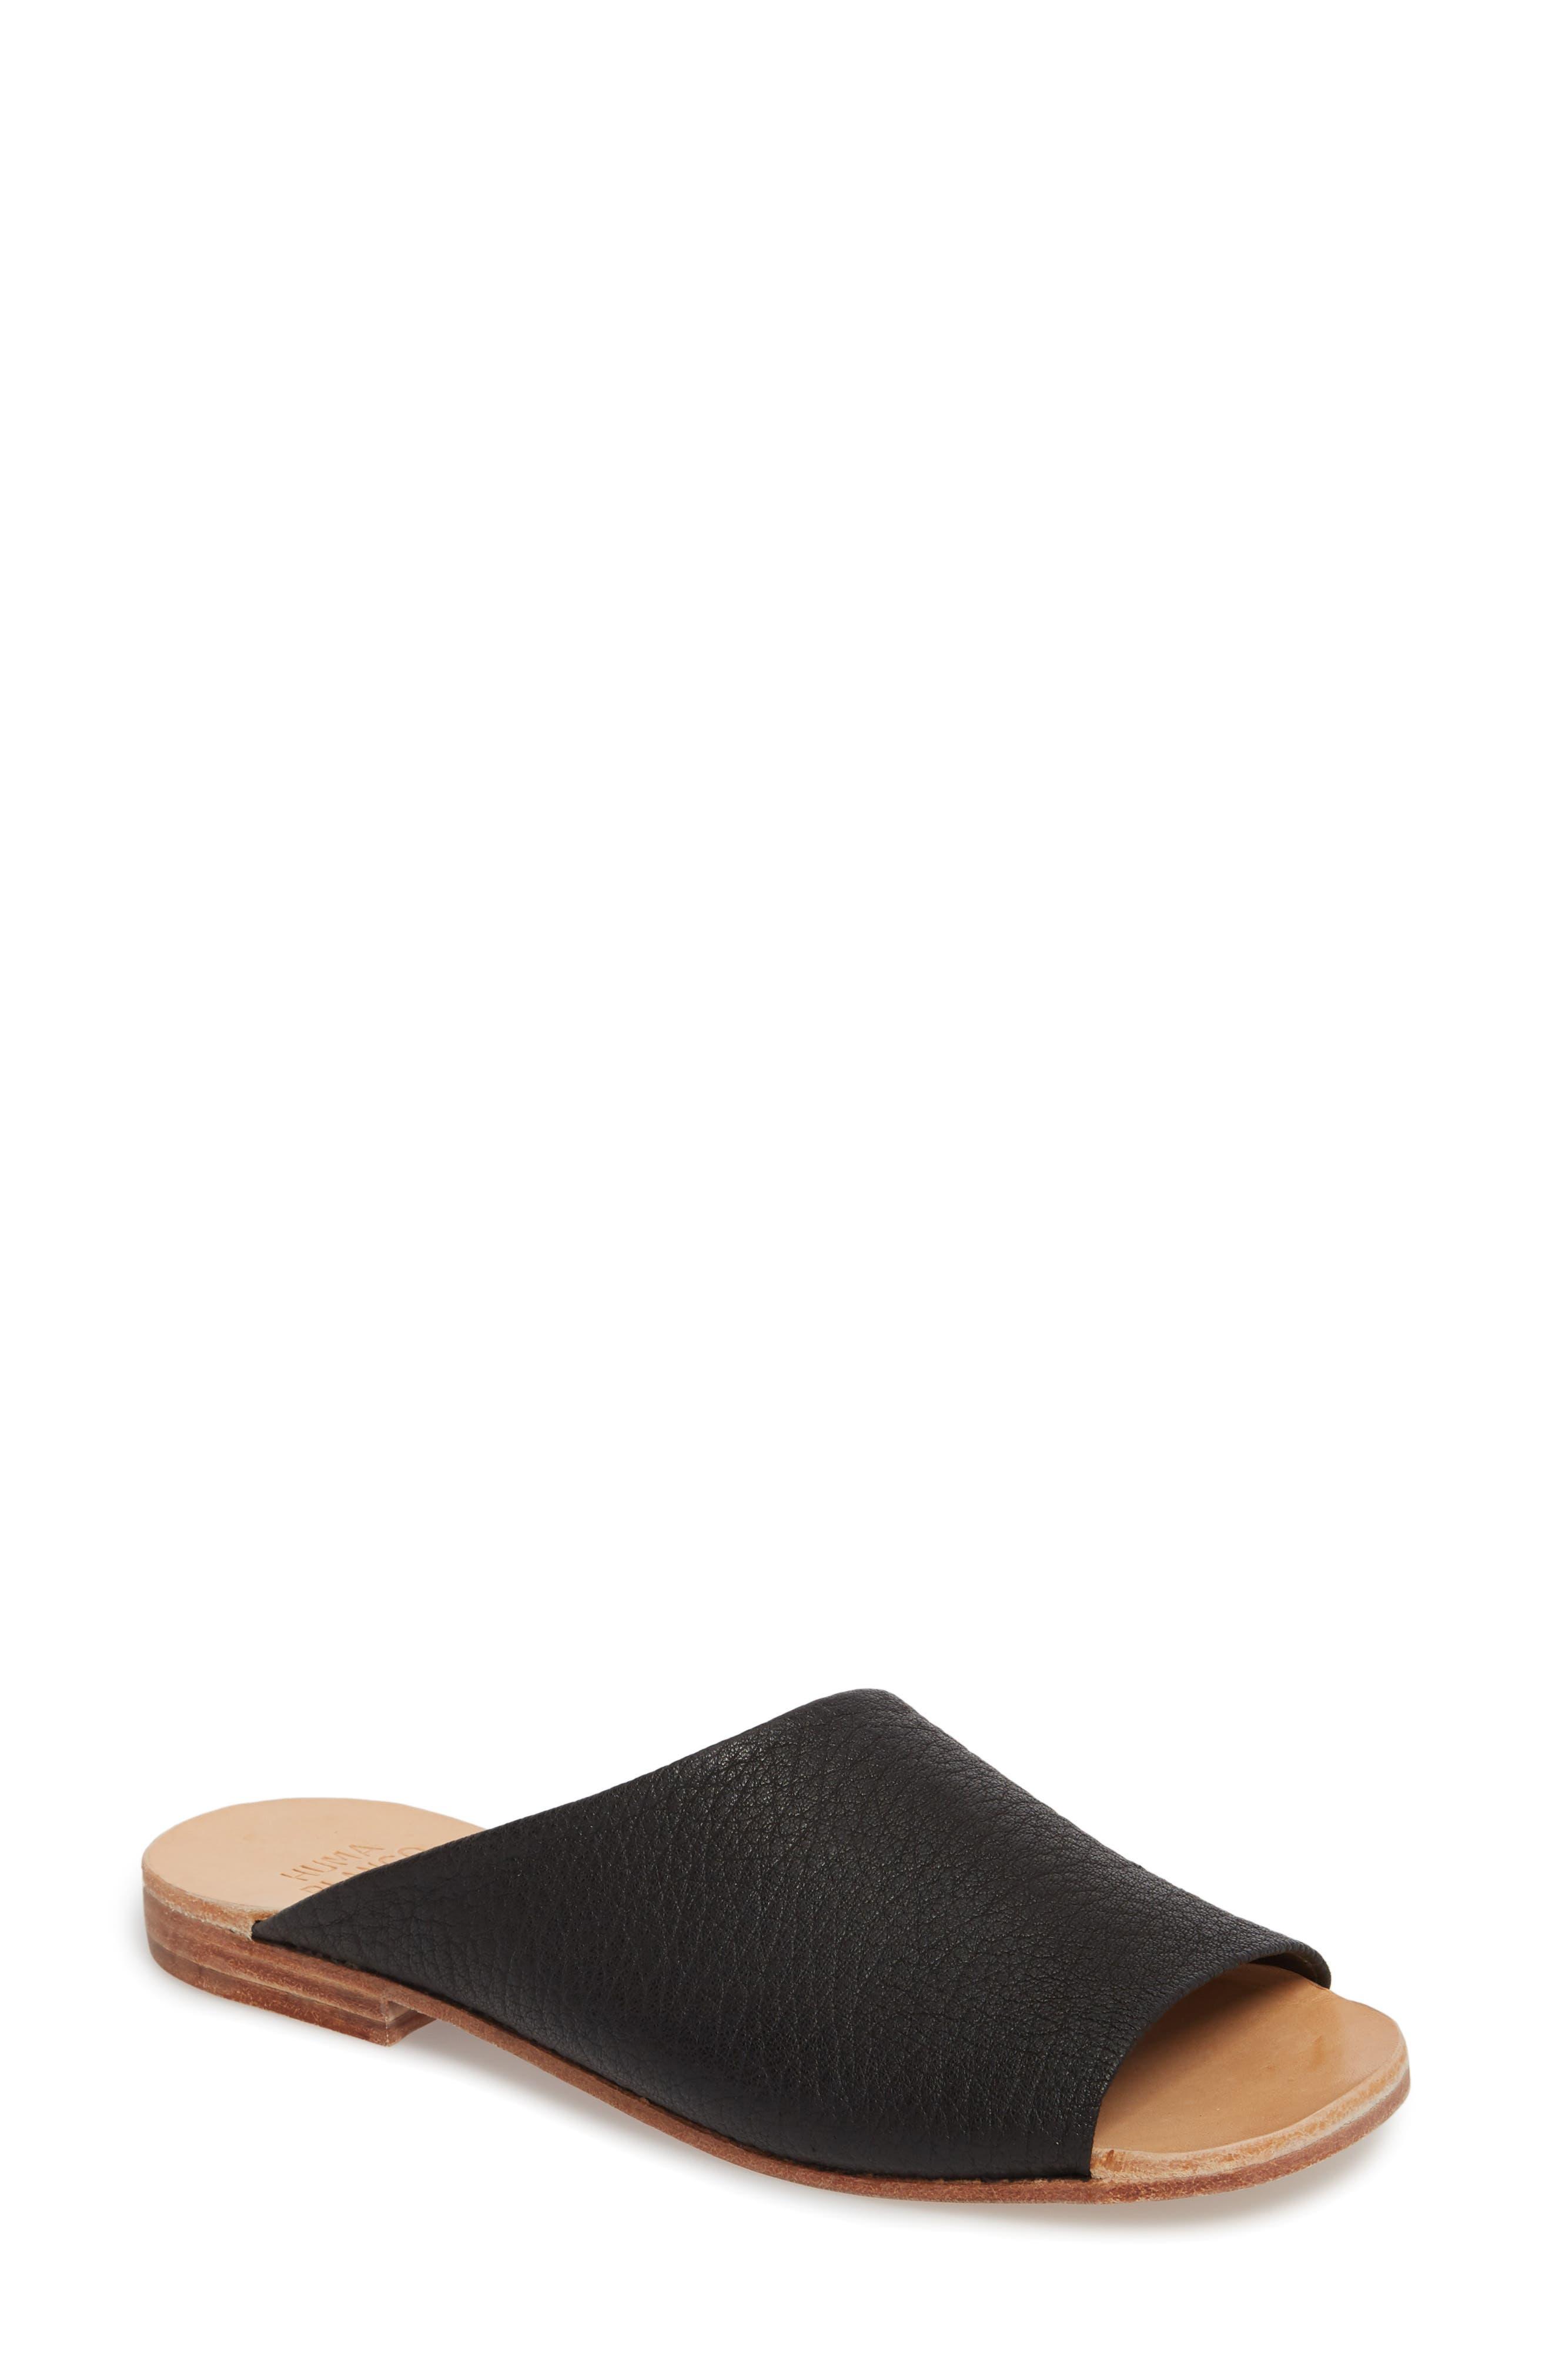 Esperanza Slide Sandal,                         Main,                         color, Coal Leather